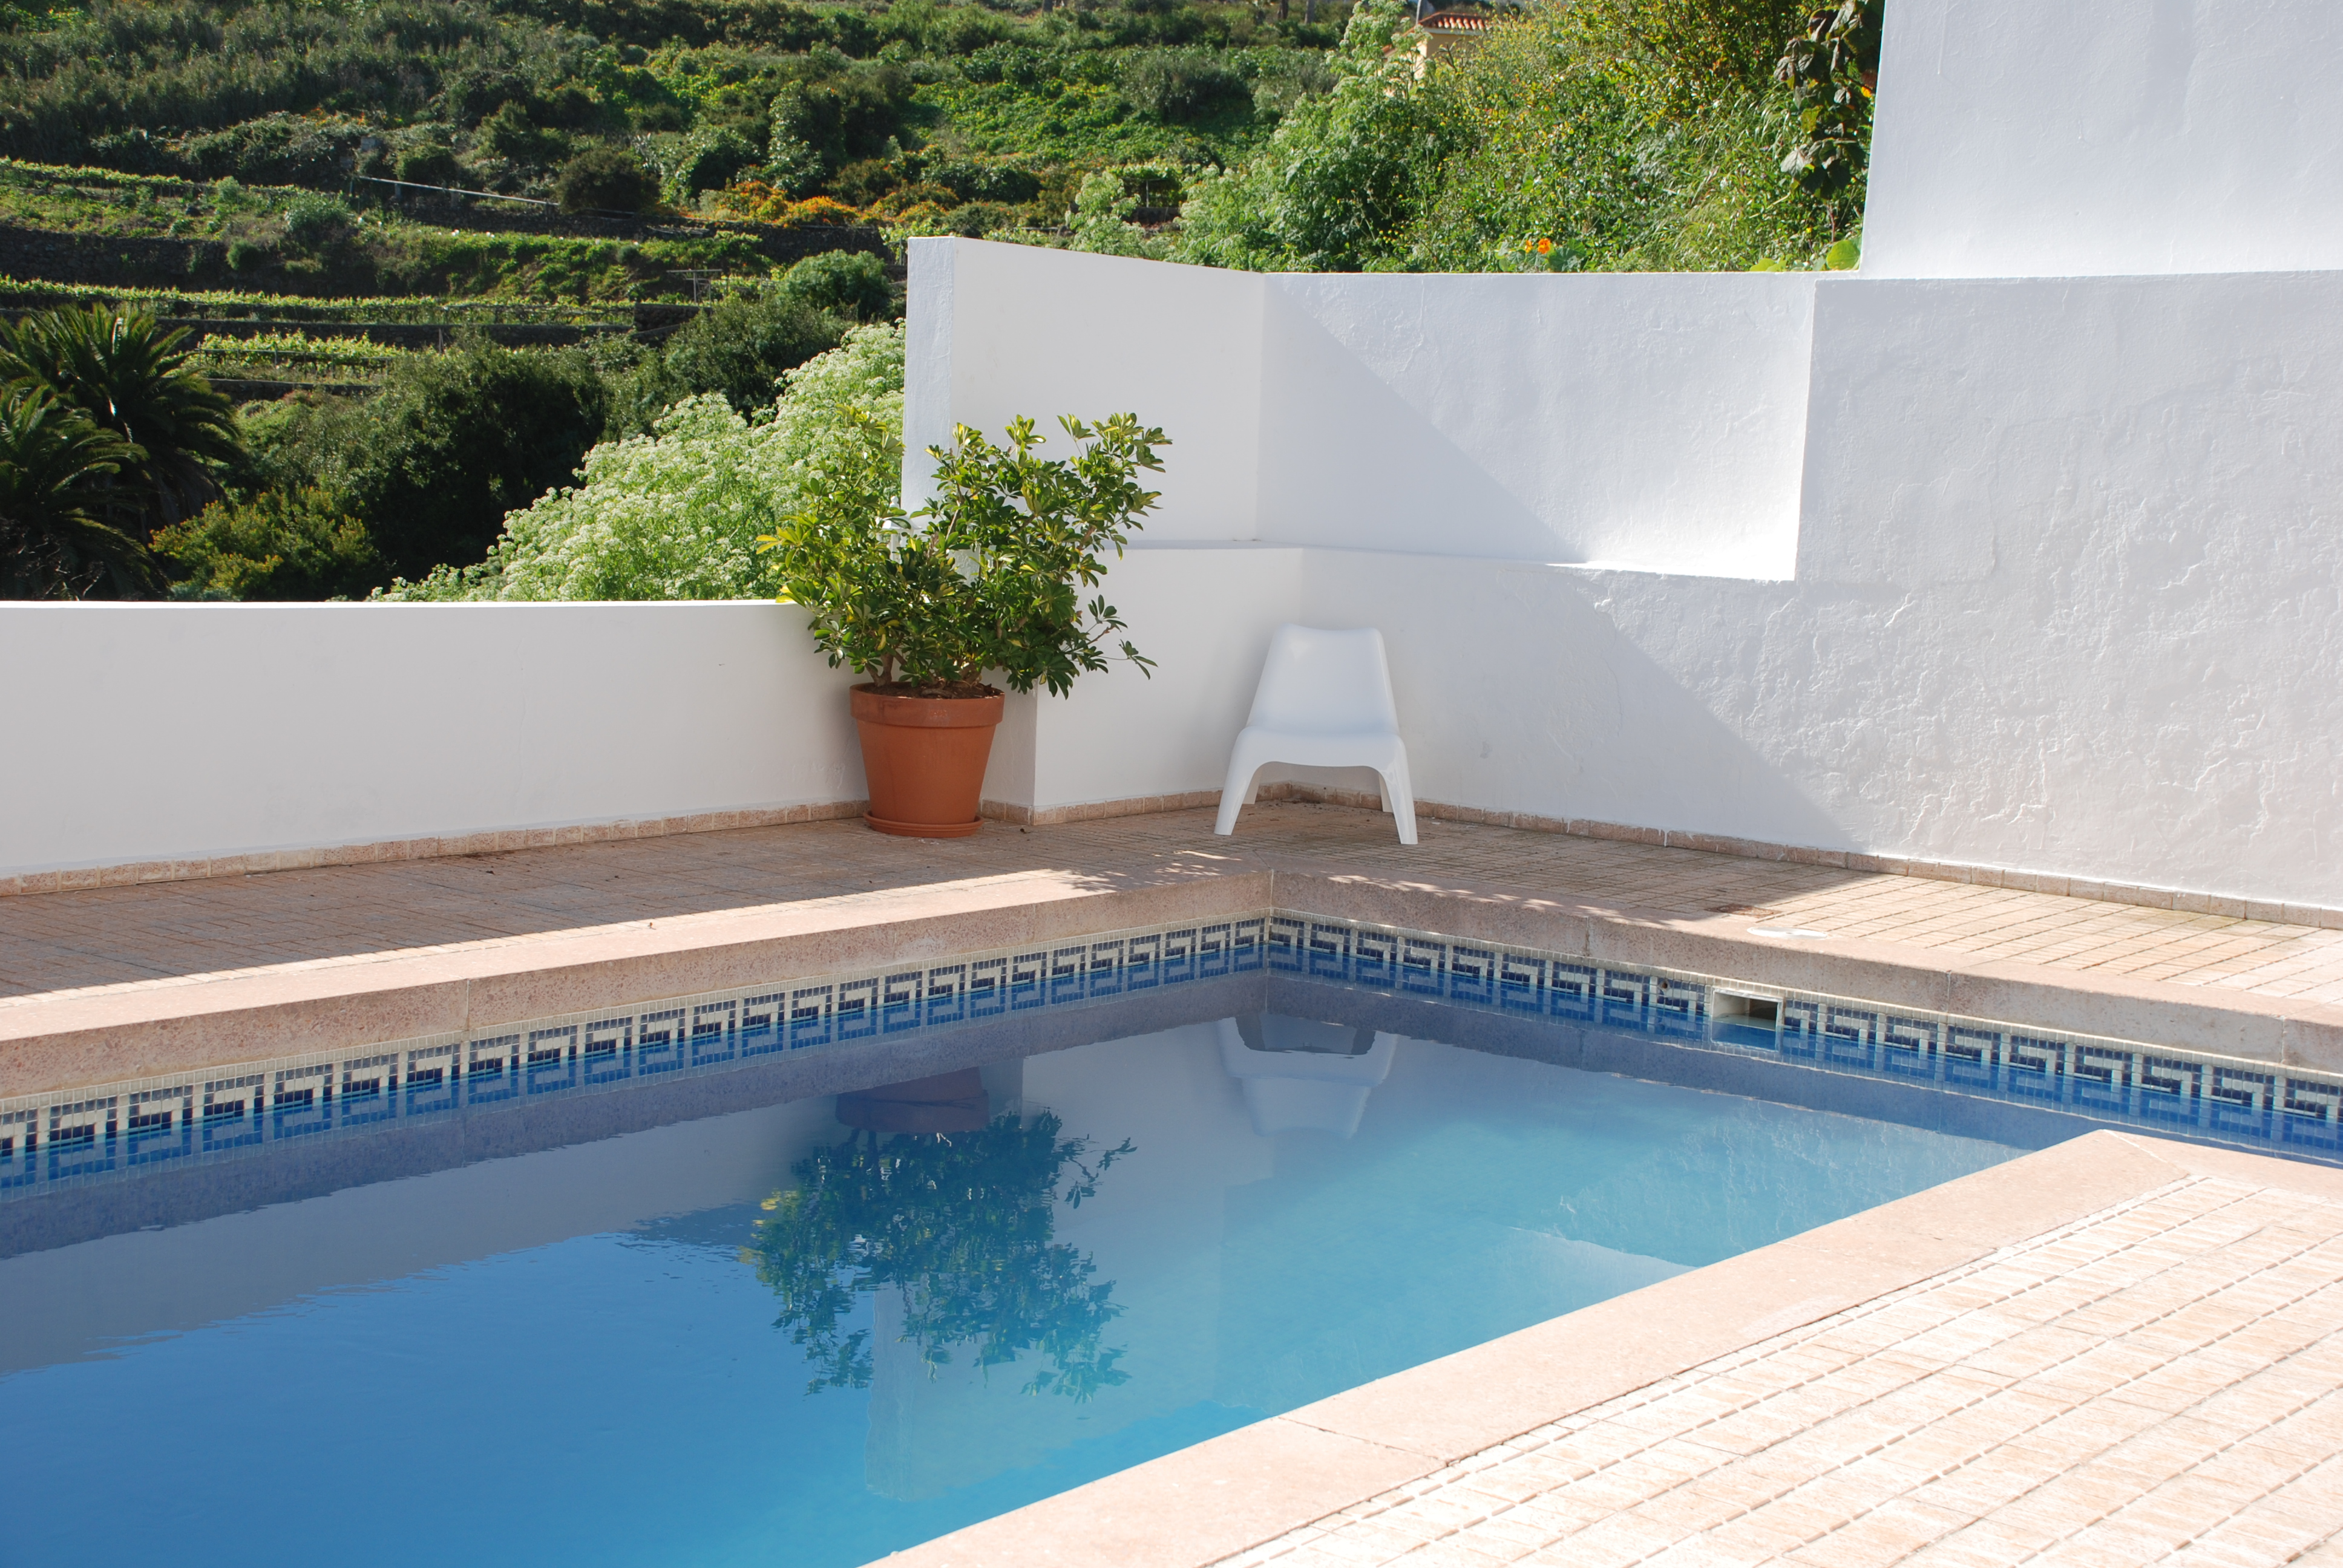 Maison de vacances Villa Vista La Quinta beheizbarer Pool kostenloses WLAN Grill (2124407), Santa Ursula, Ténérife, Iles Canaries, Espagne, image 80